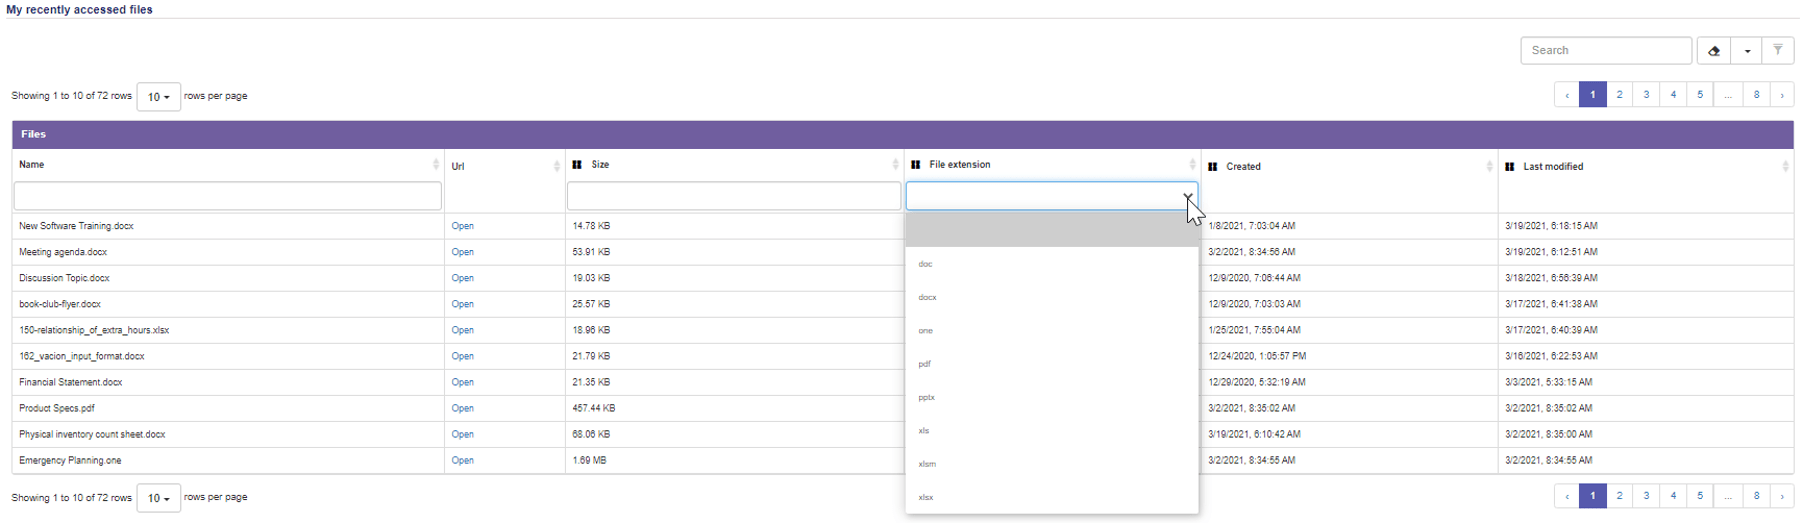 Recent Files Filter